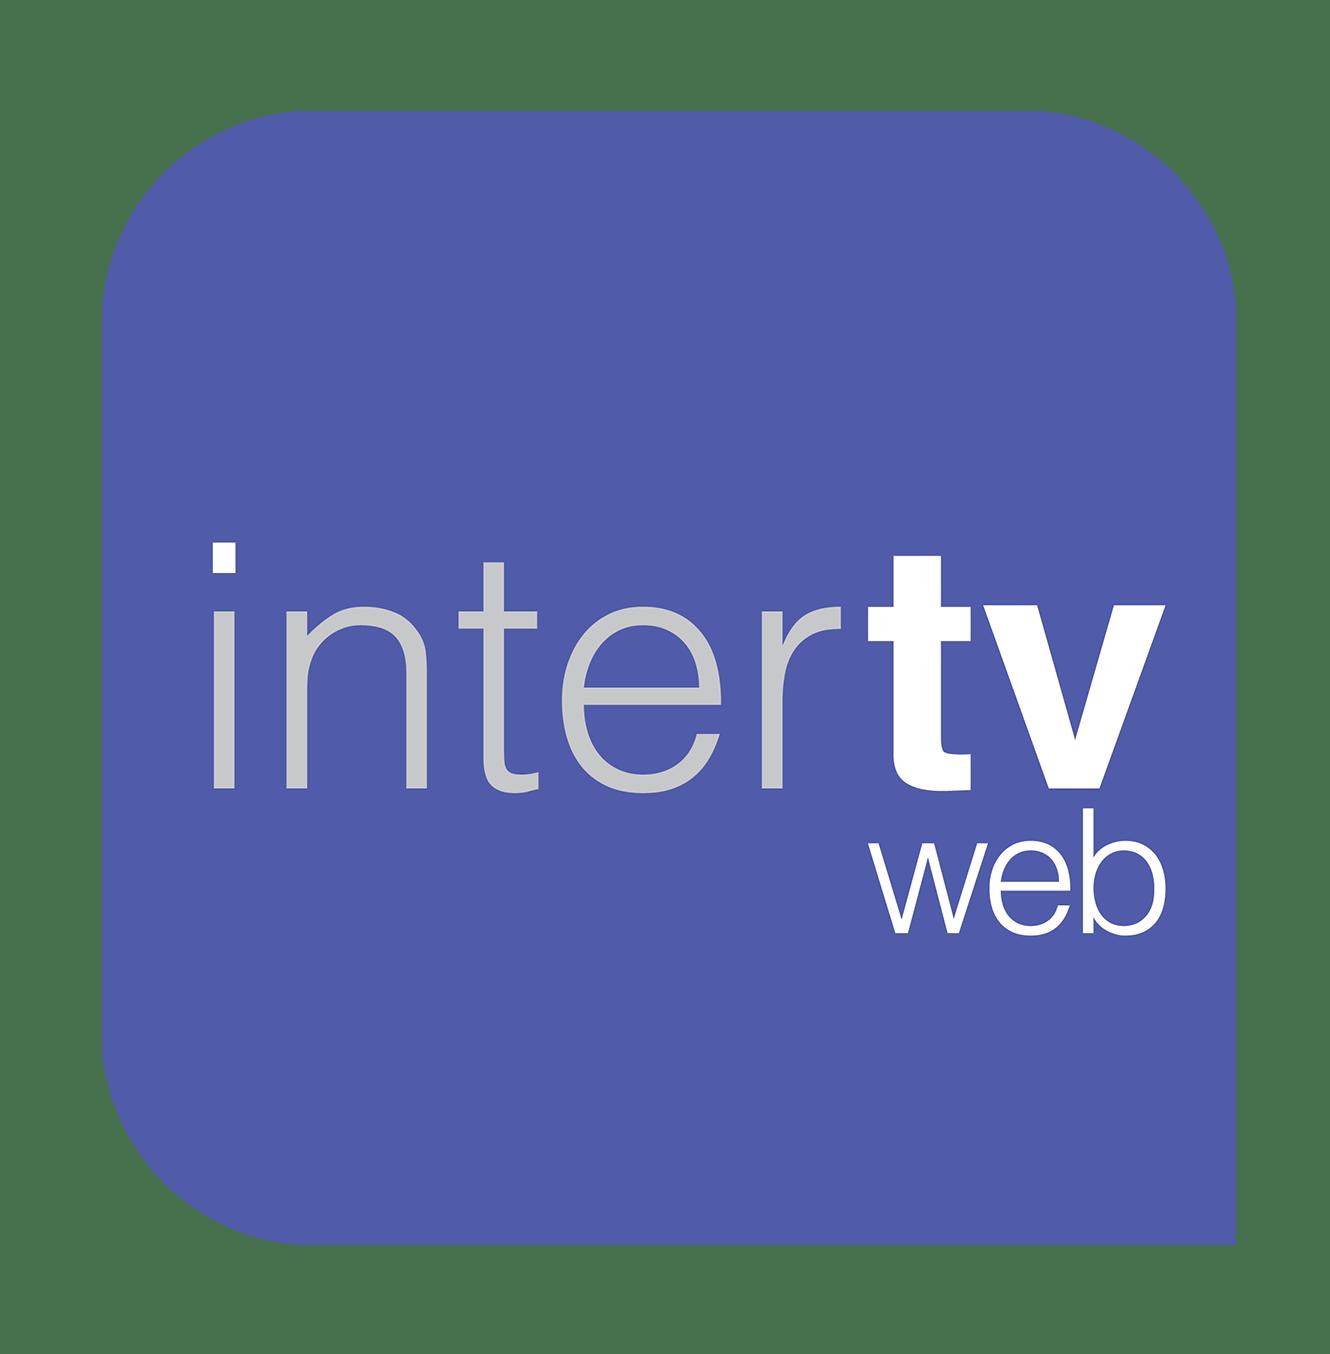 InterTV Web